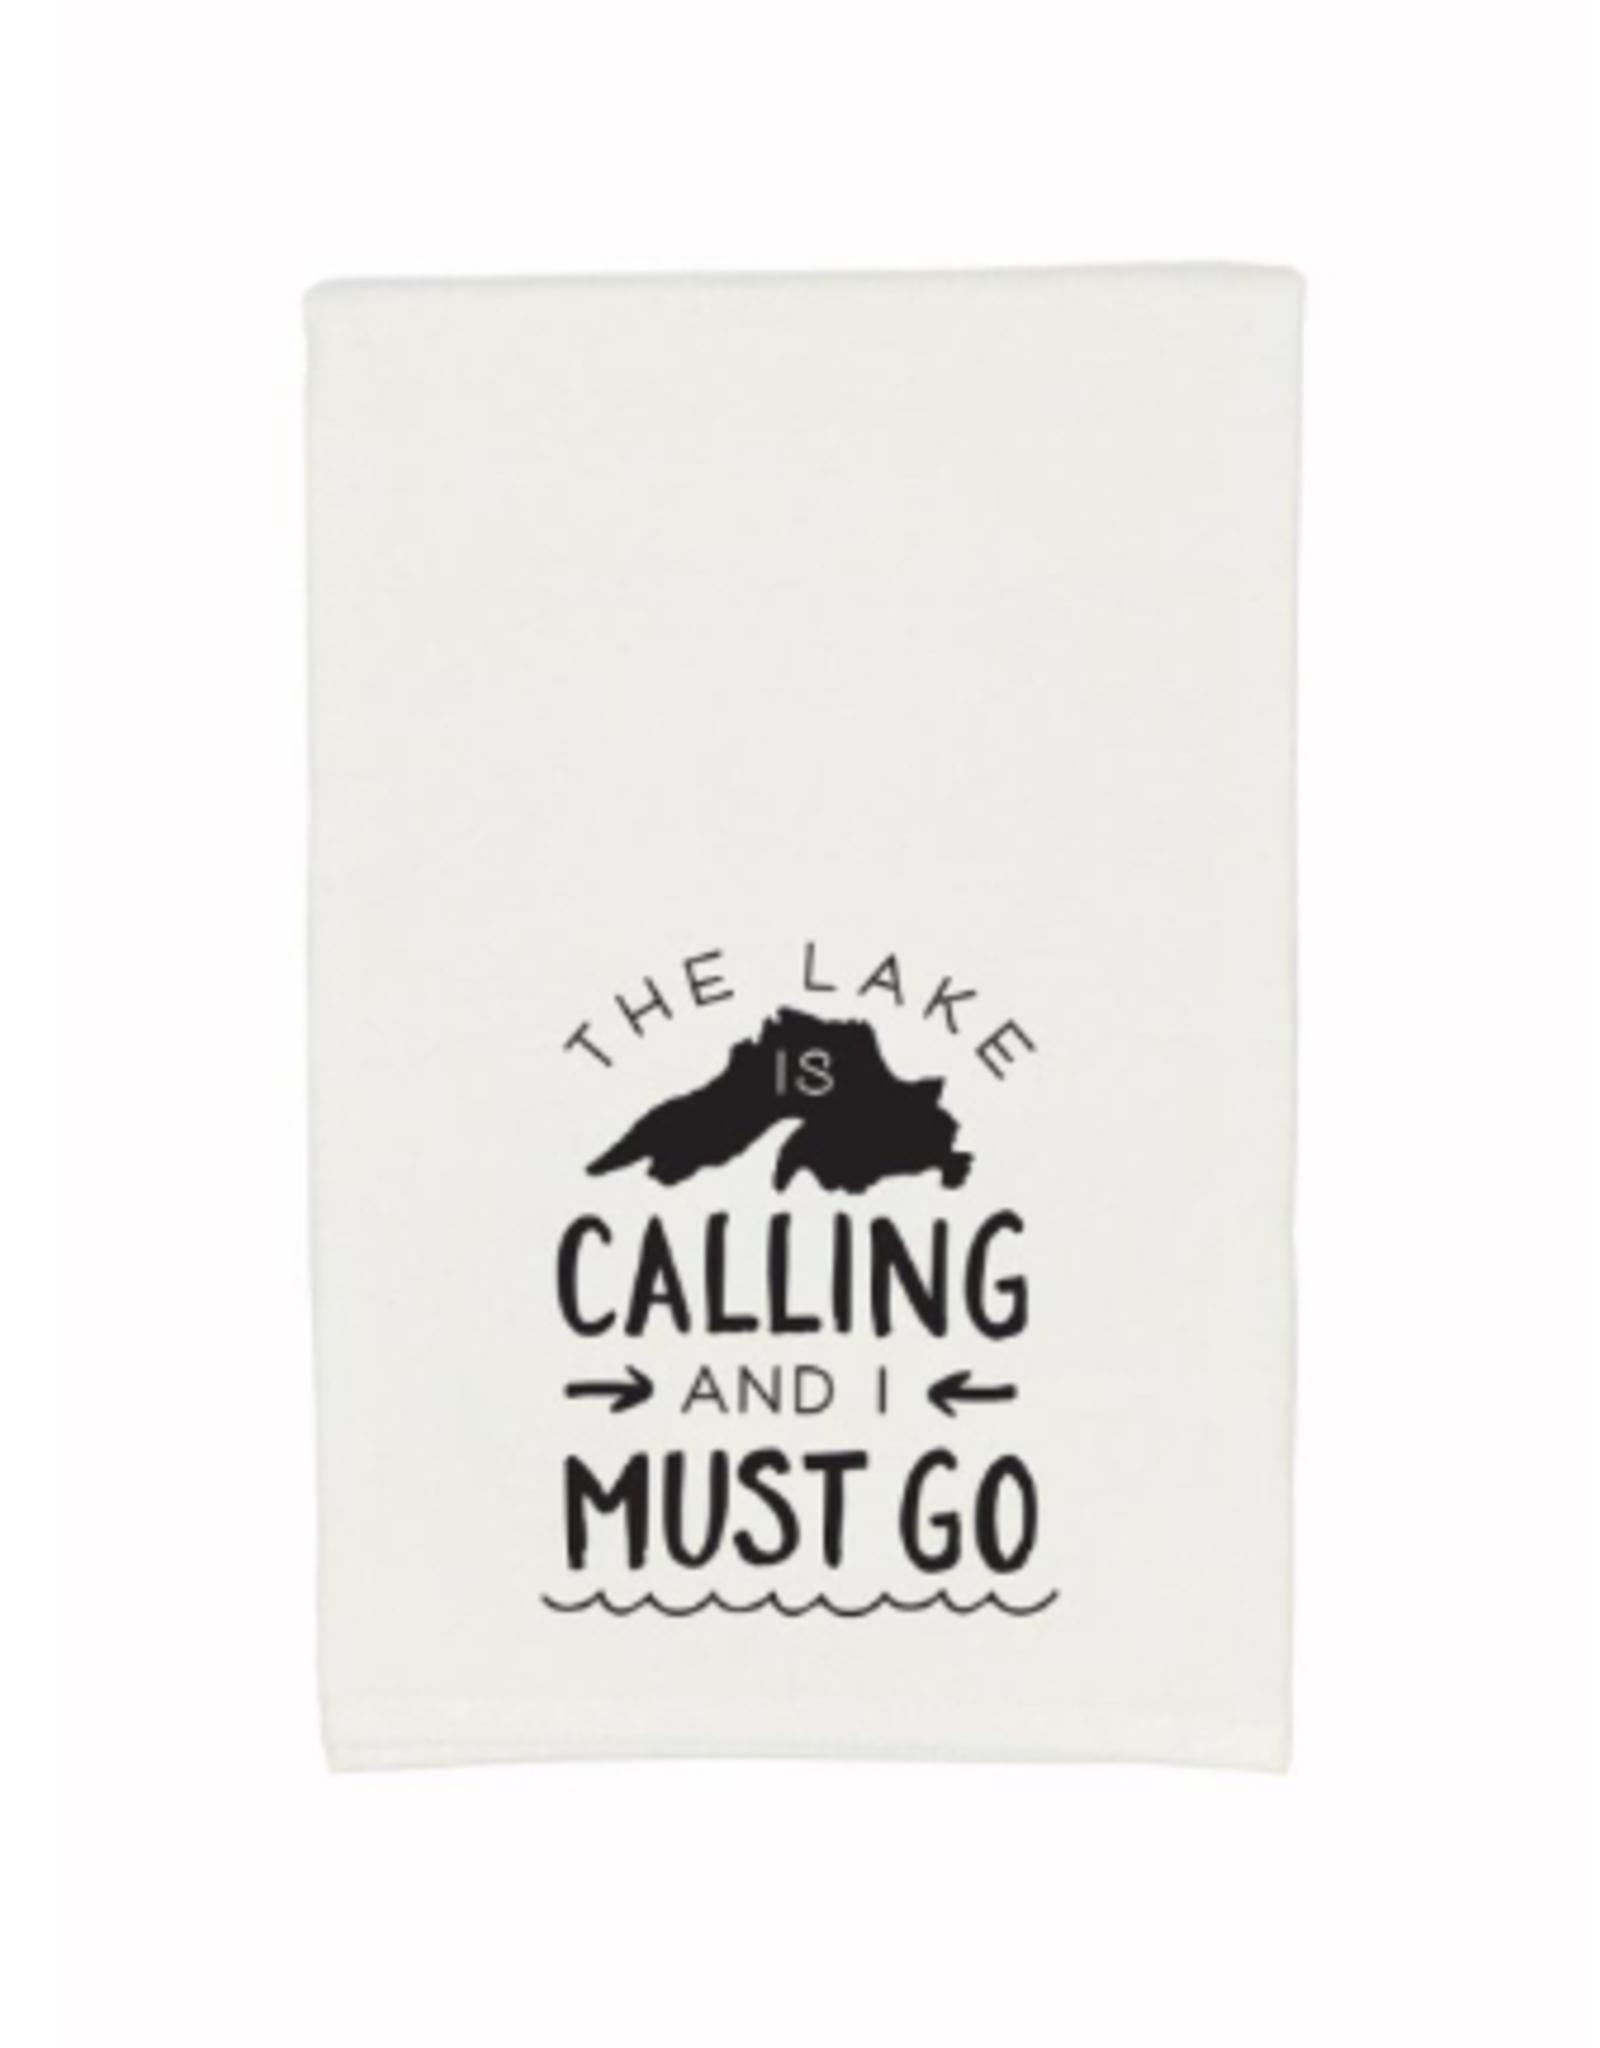 Gitch Gear Lake Superior Tea Towel, Calling